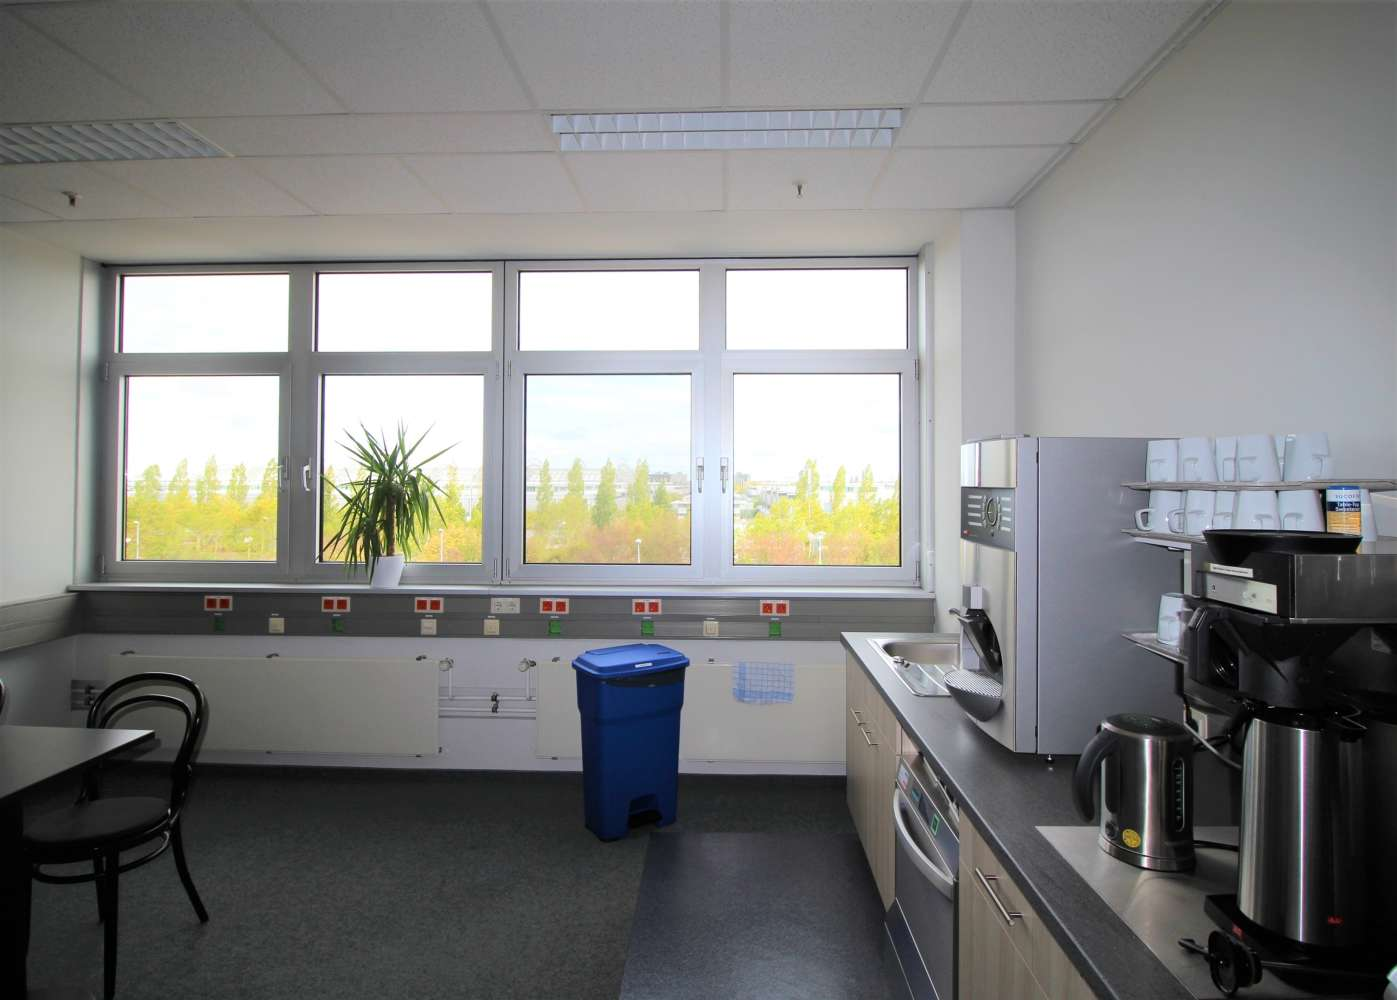 Büros Leipzig, 04356 - Büro - Leipzig, Seehausen - B1693 - 10041971